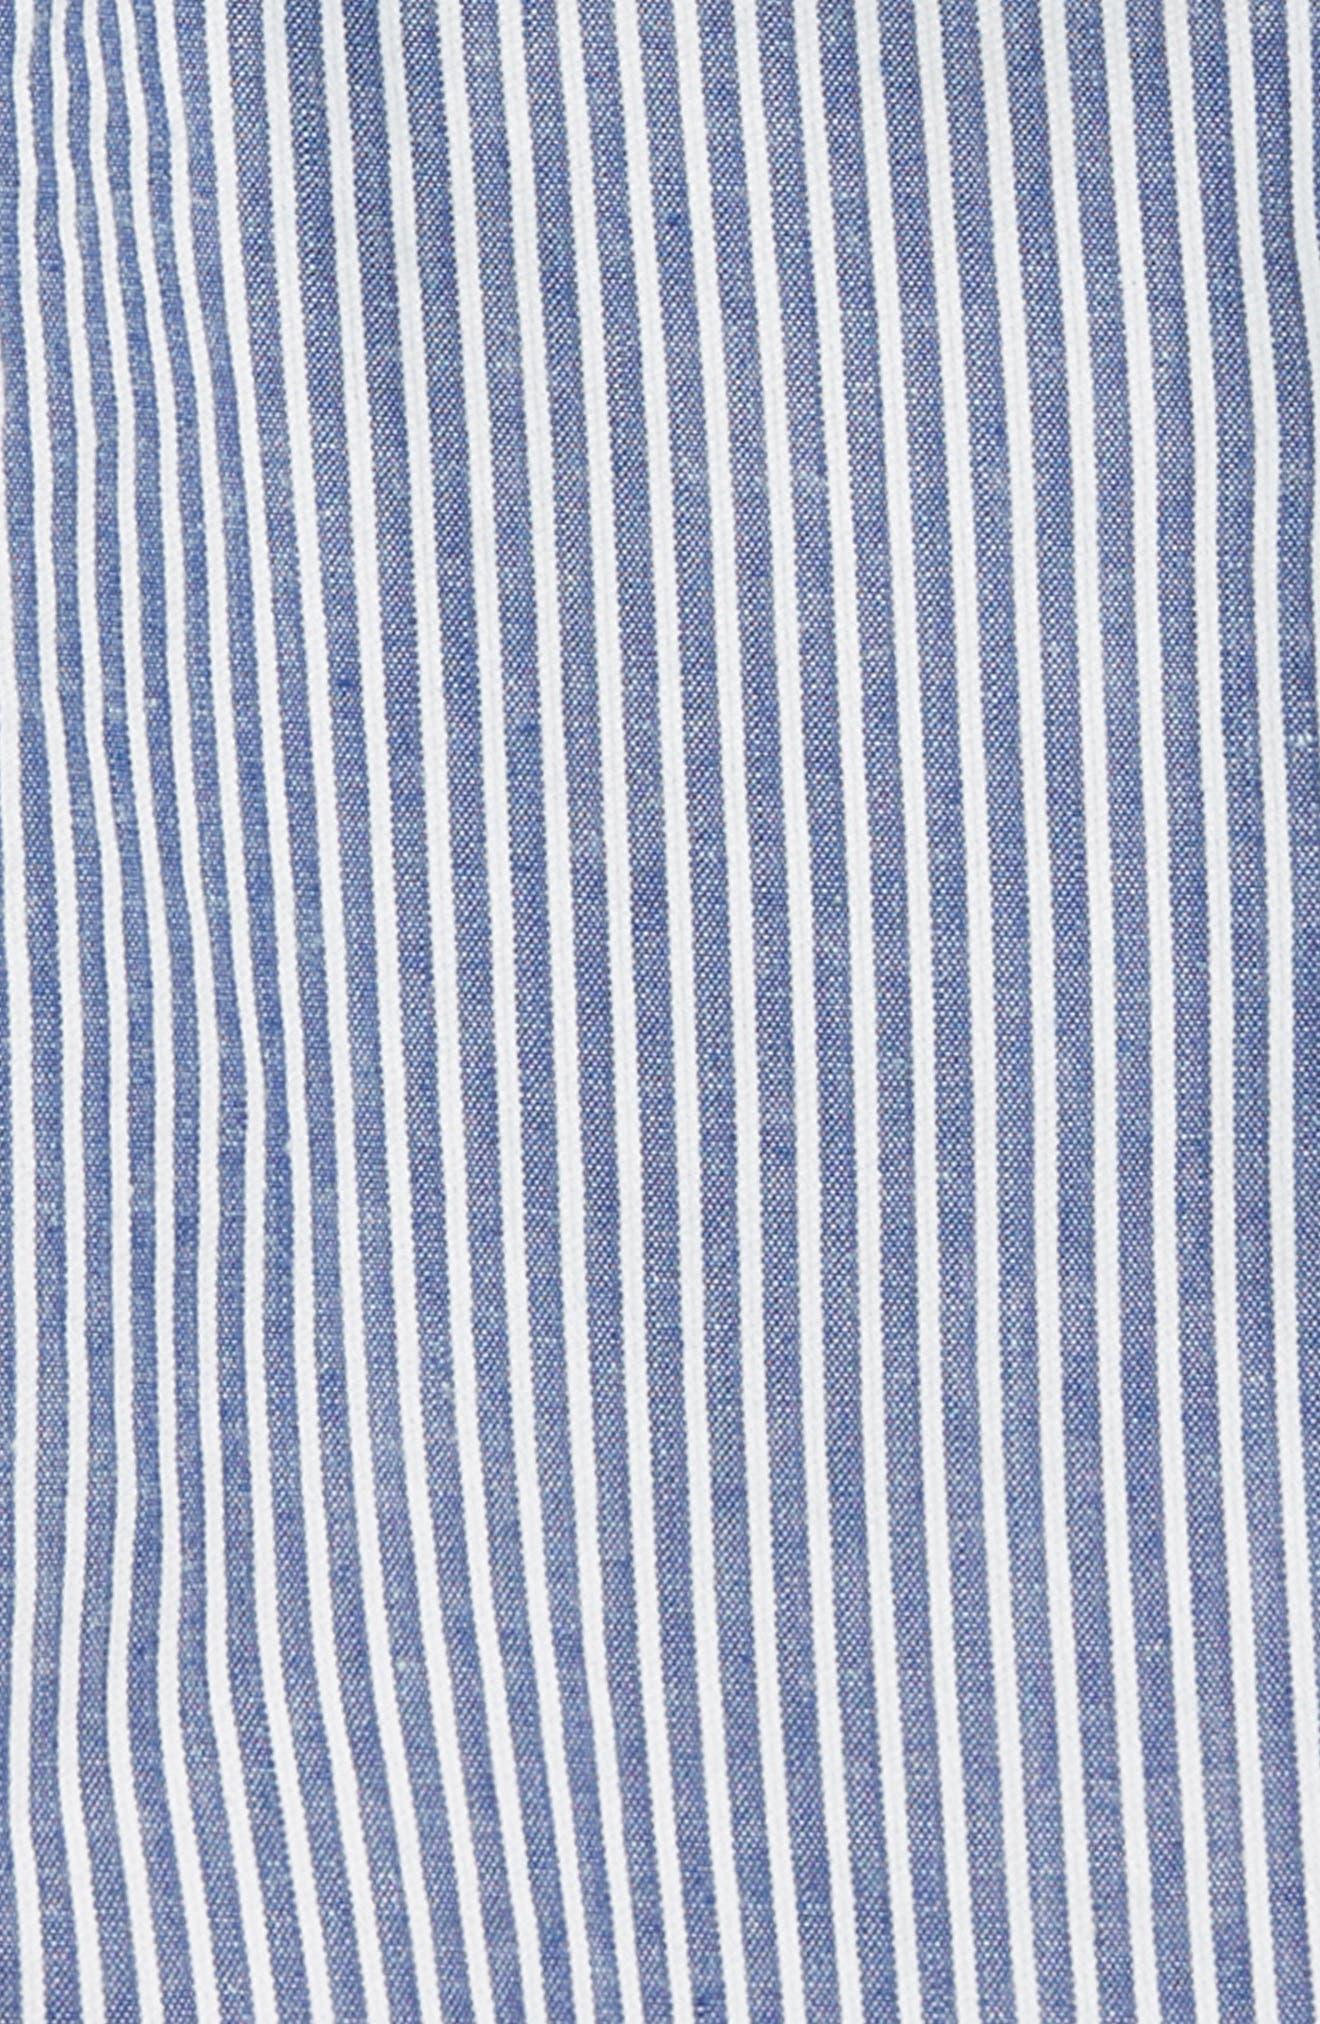 Smart Stripe Shorts,                             Alternate thumbnail 2, color,                             Duke Blue/ Ecru Seersucker